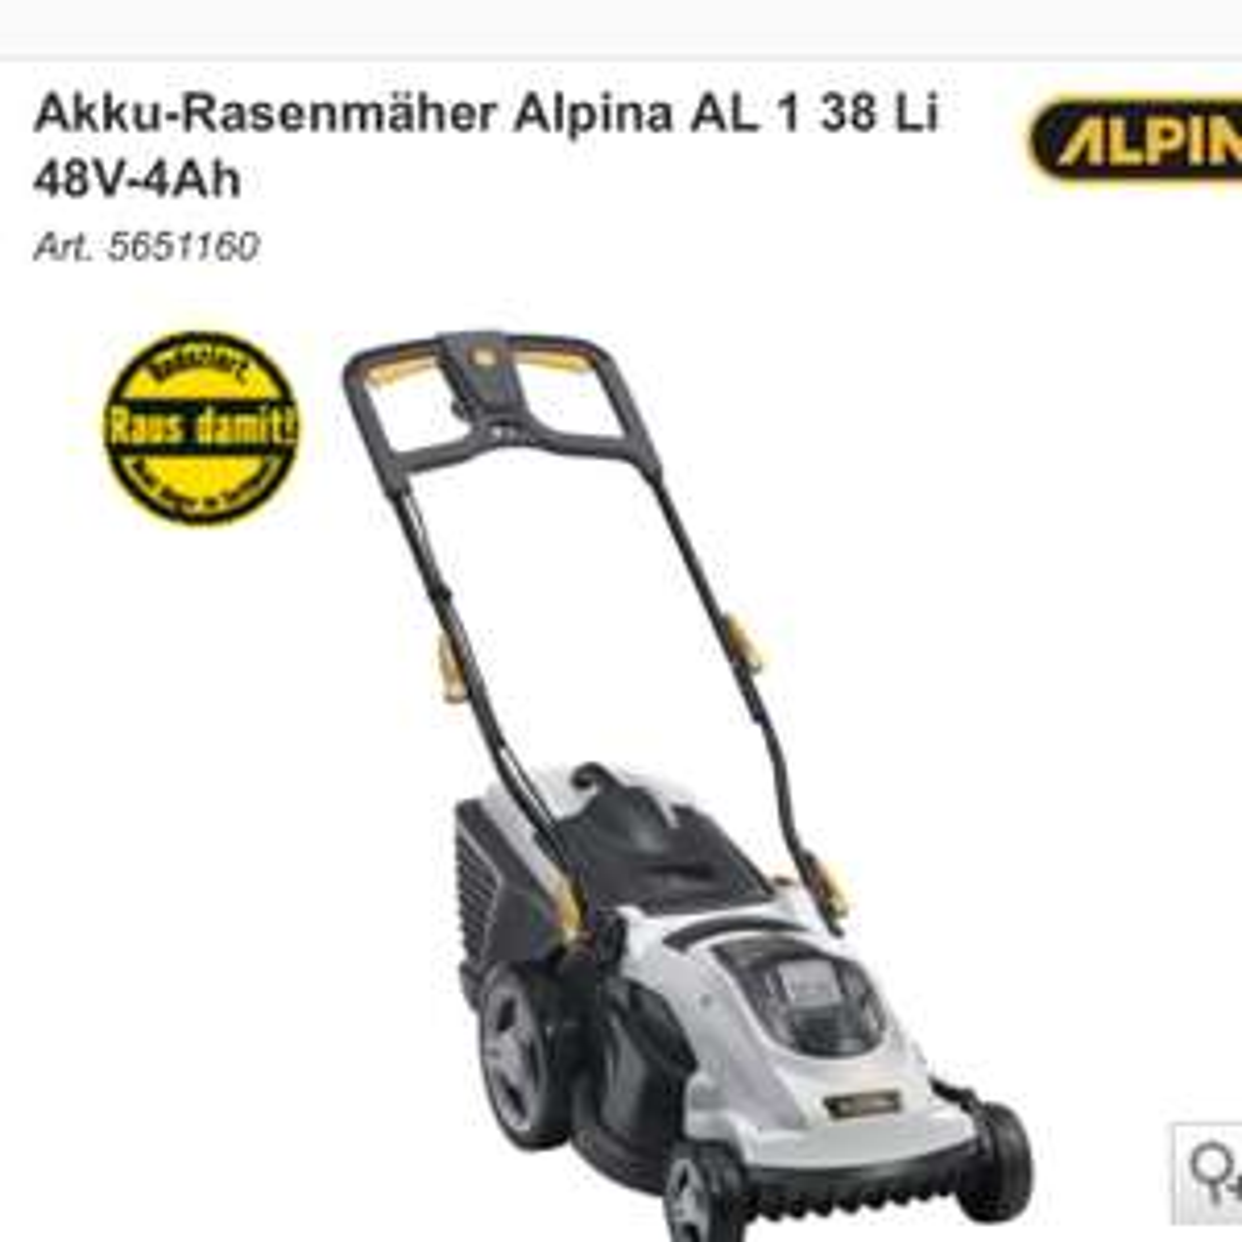 Alpina AL1 38 LI Akku Rasenmäher